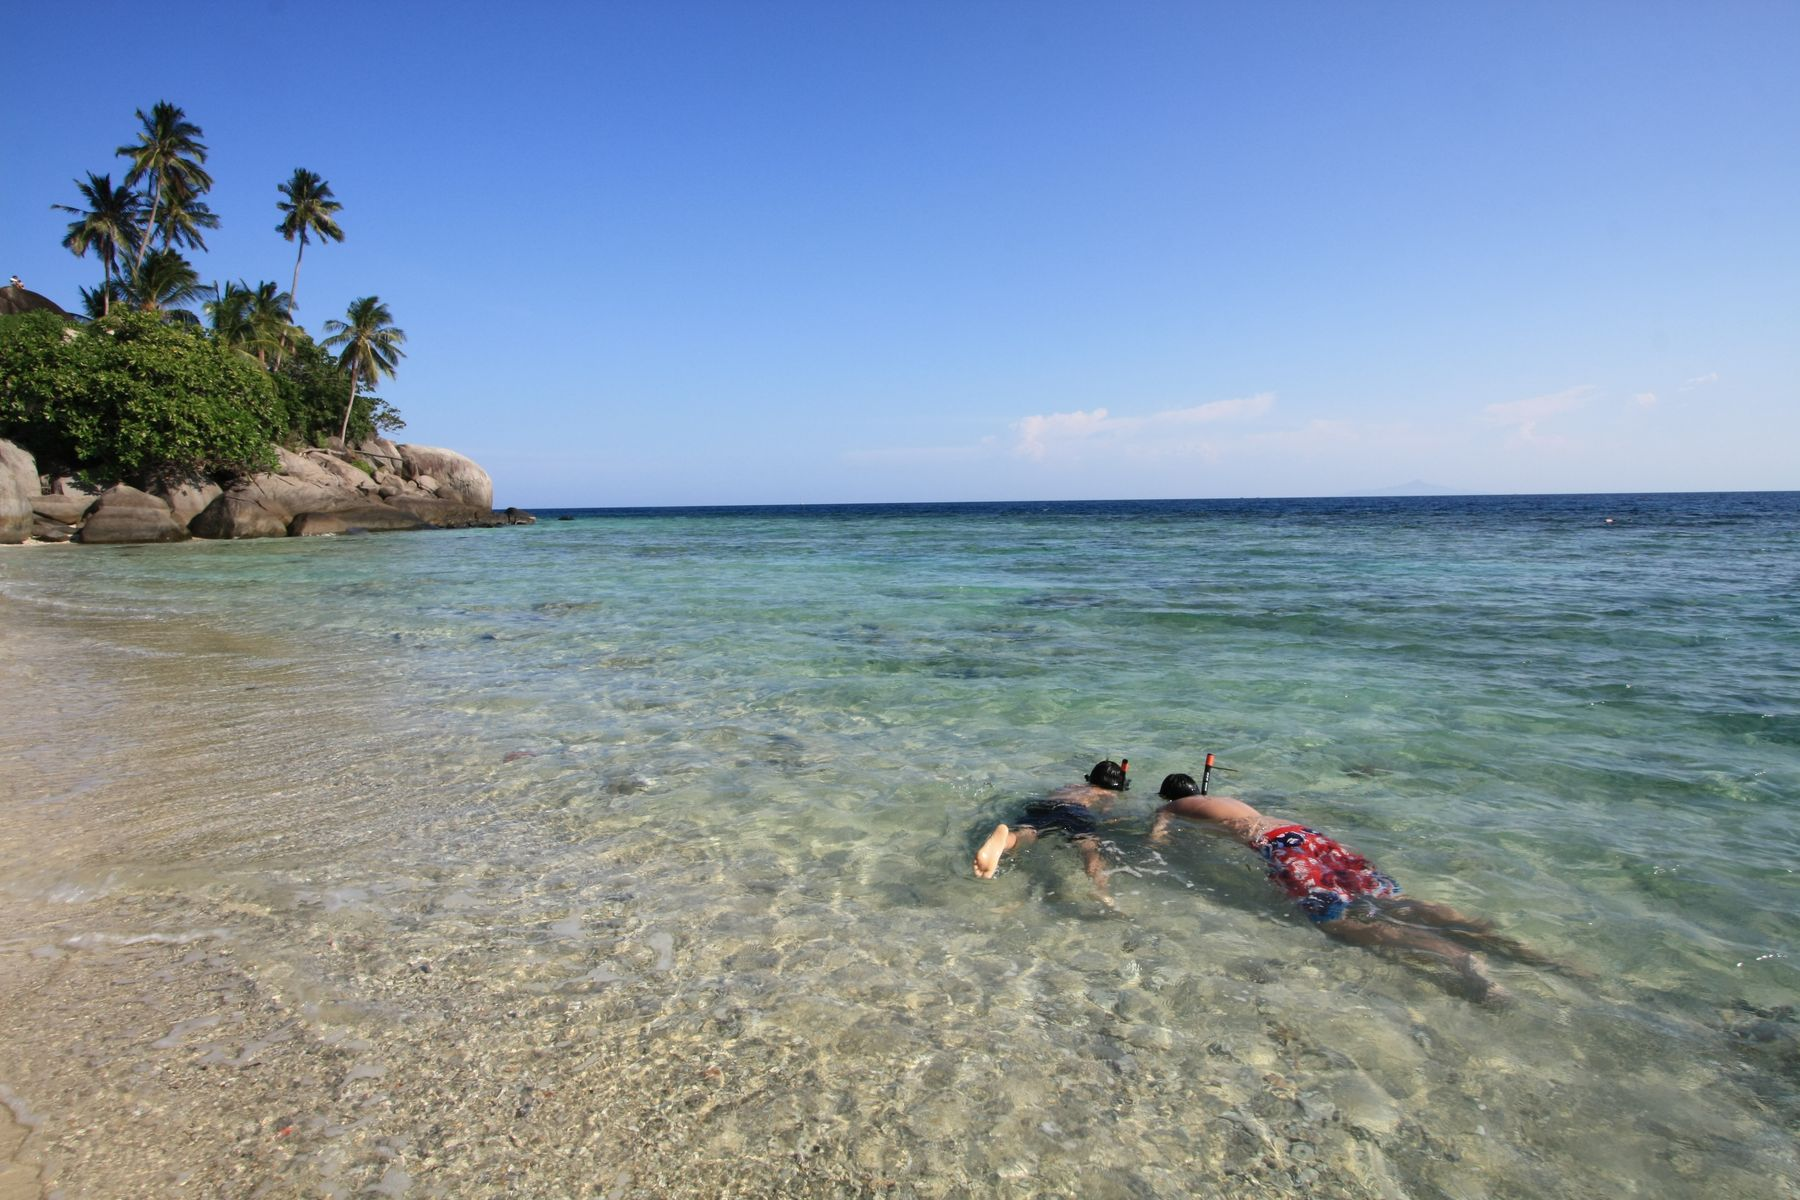 Kids snorkelling on a quiet beach.